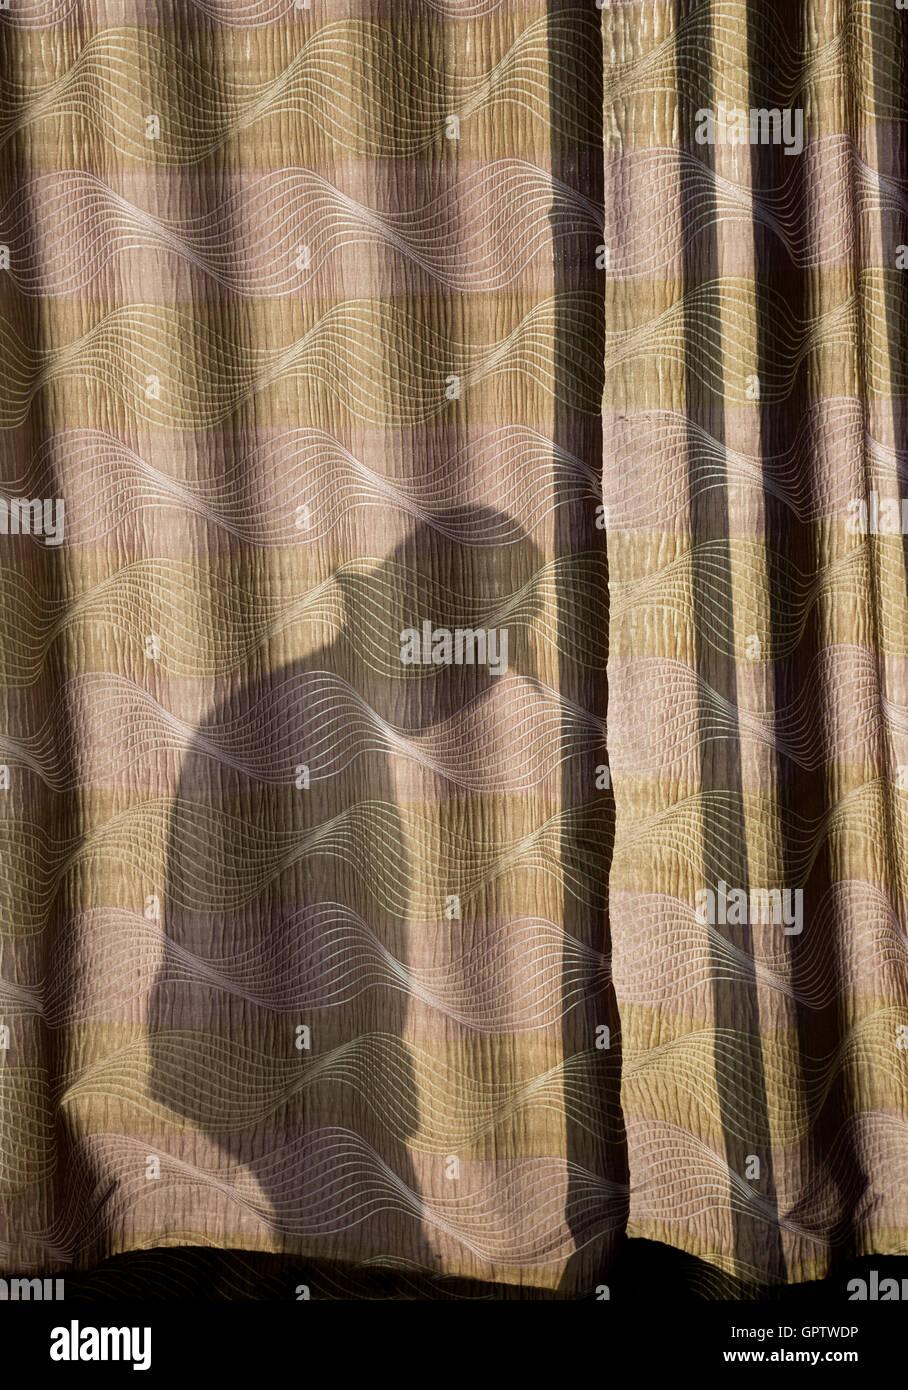 Stranger creeping around outside window - Stock Image